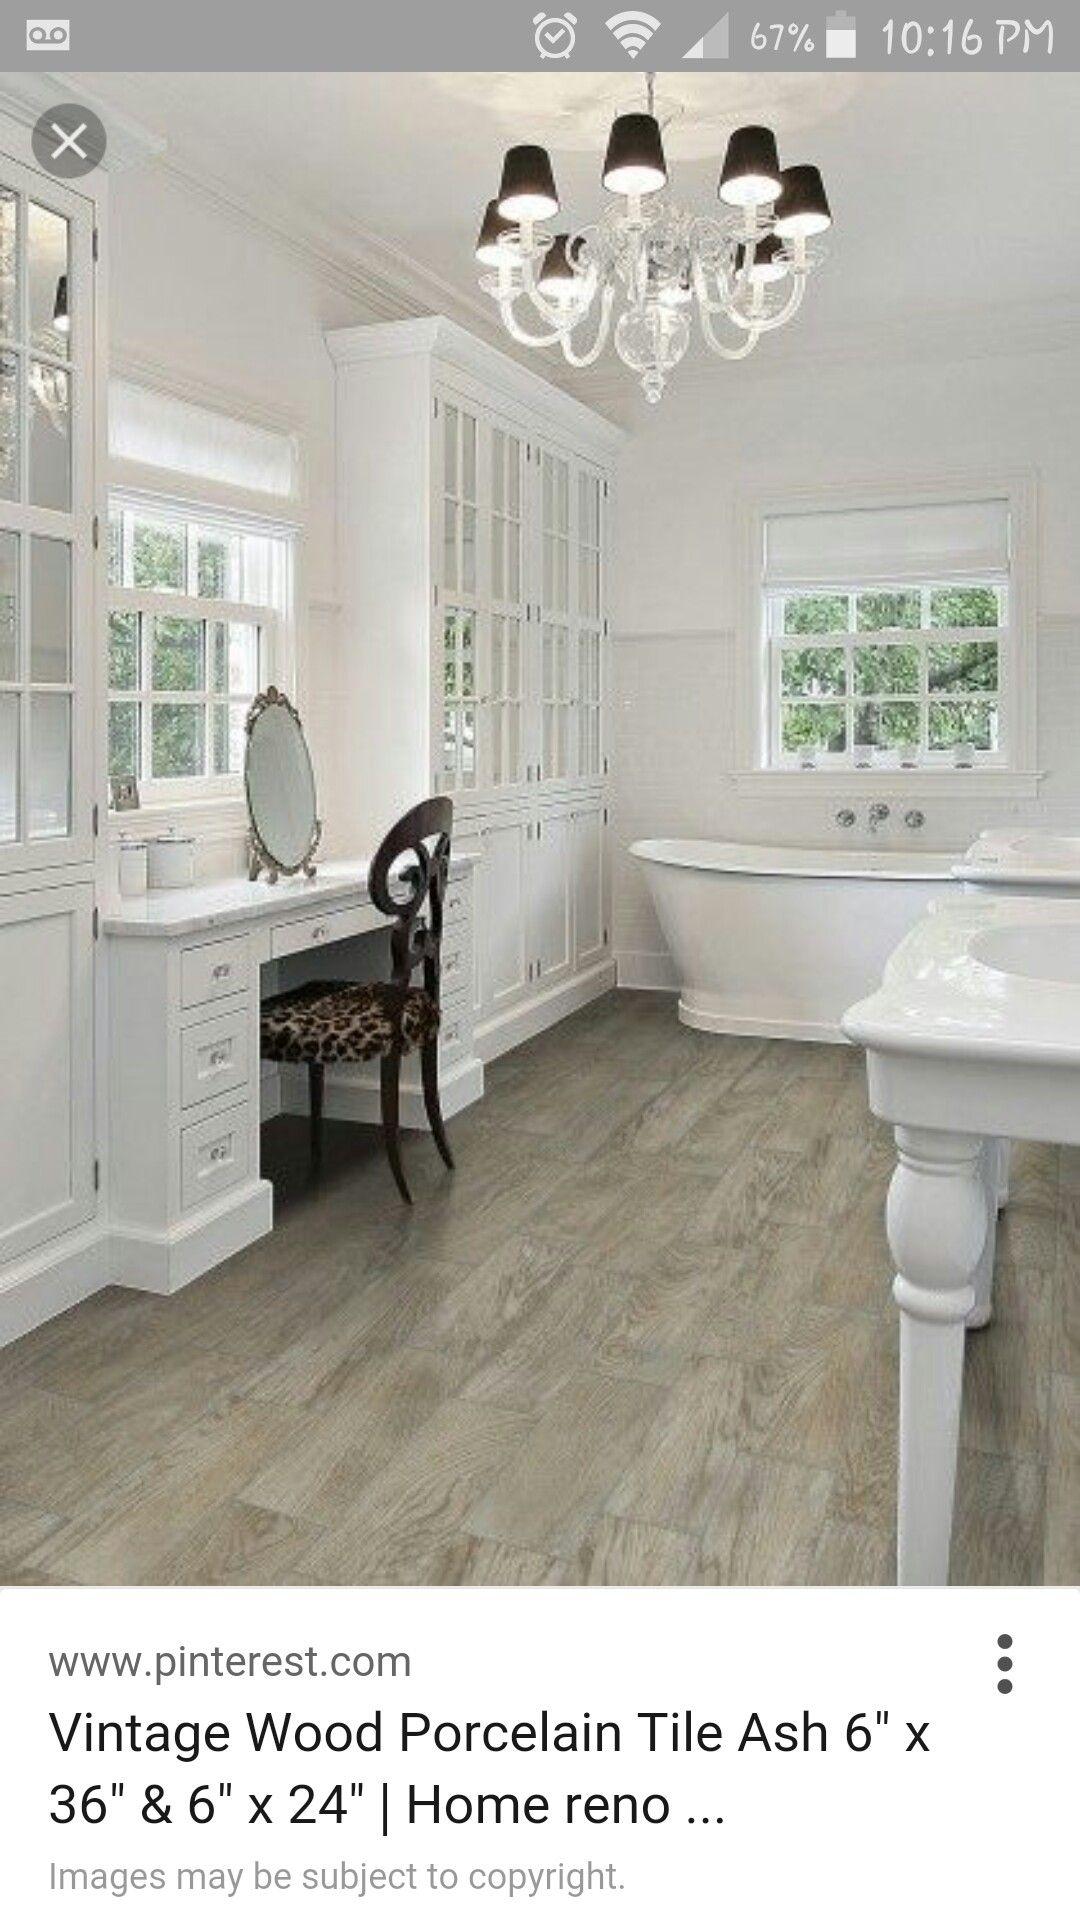 Ash wood ceramic tile floors | Soon to be Future | Pinterest | Wood ...